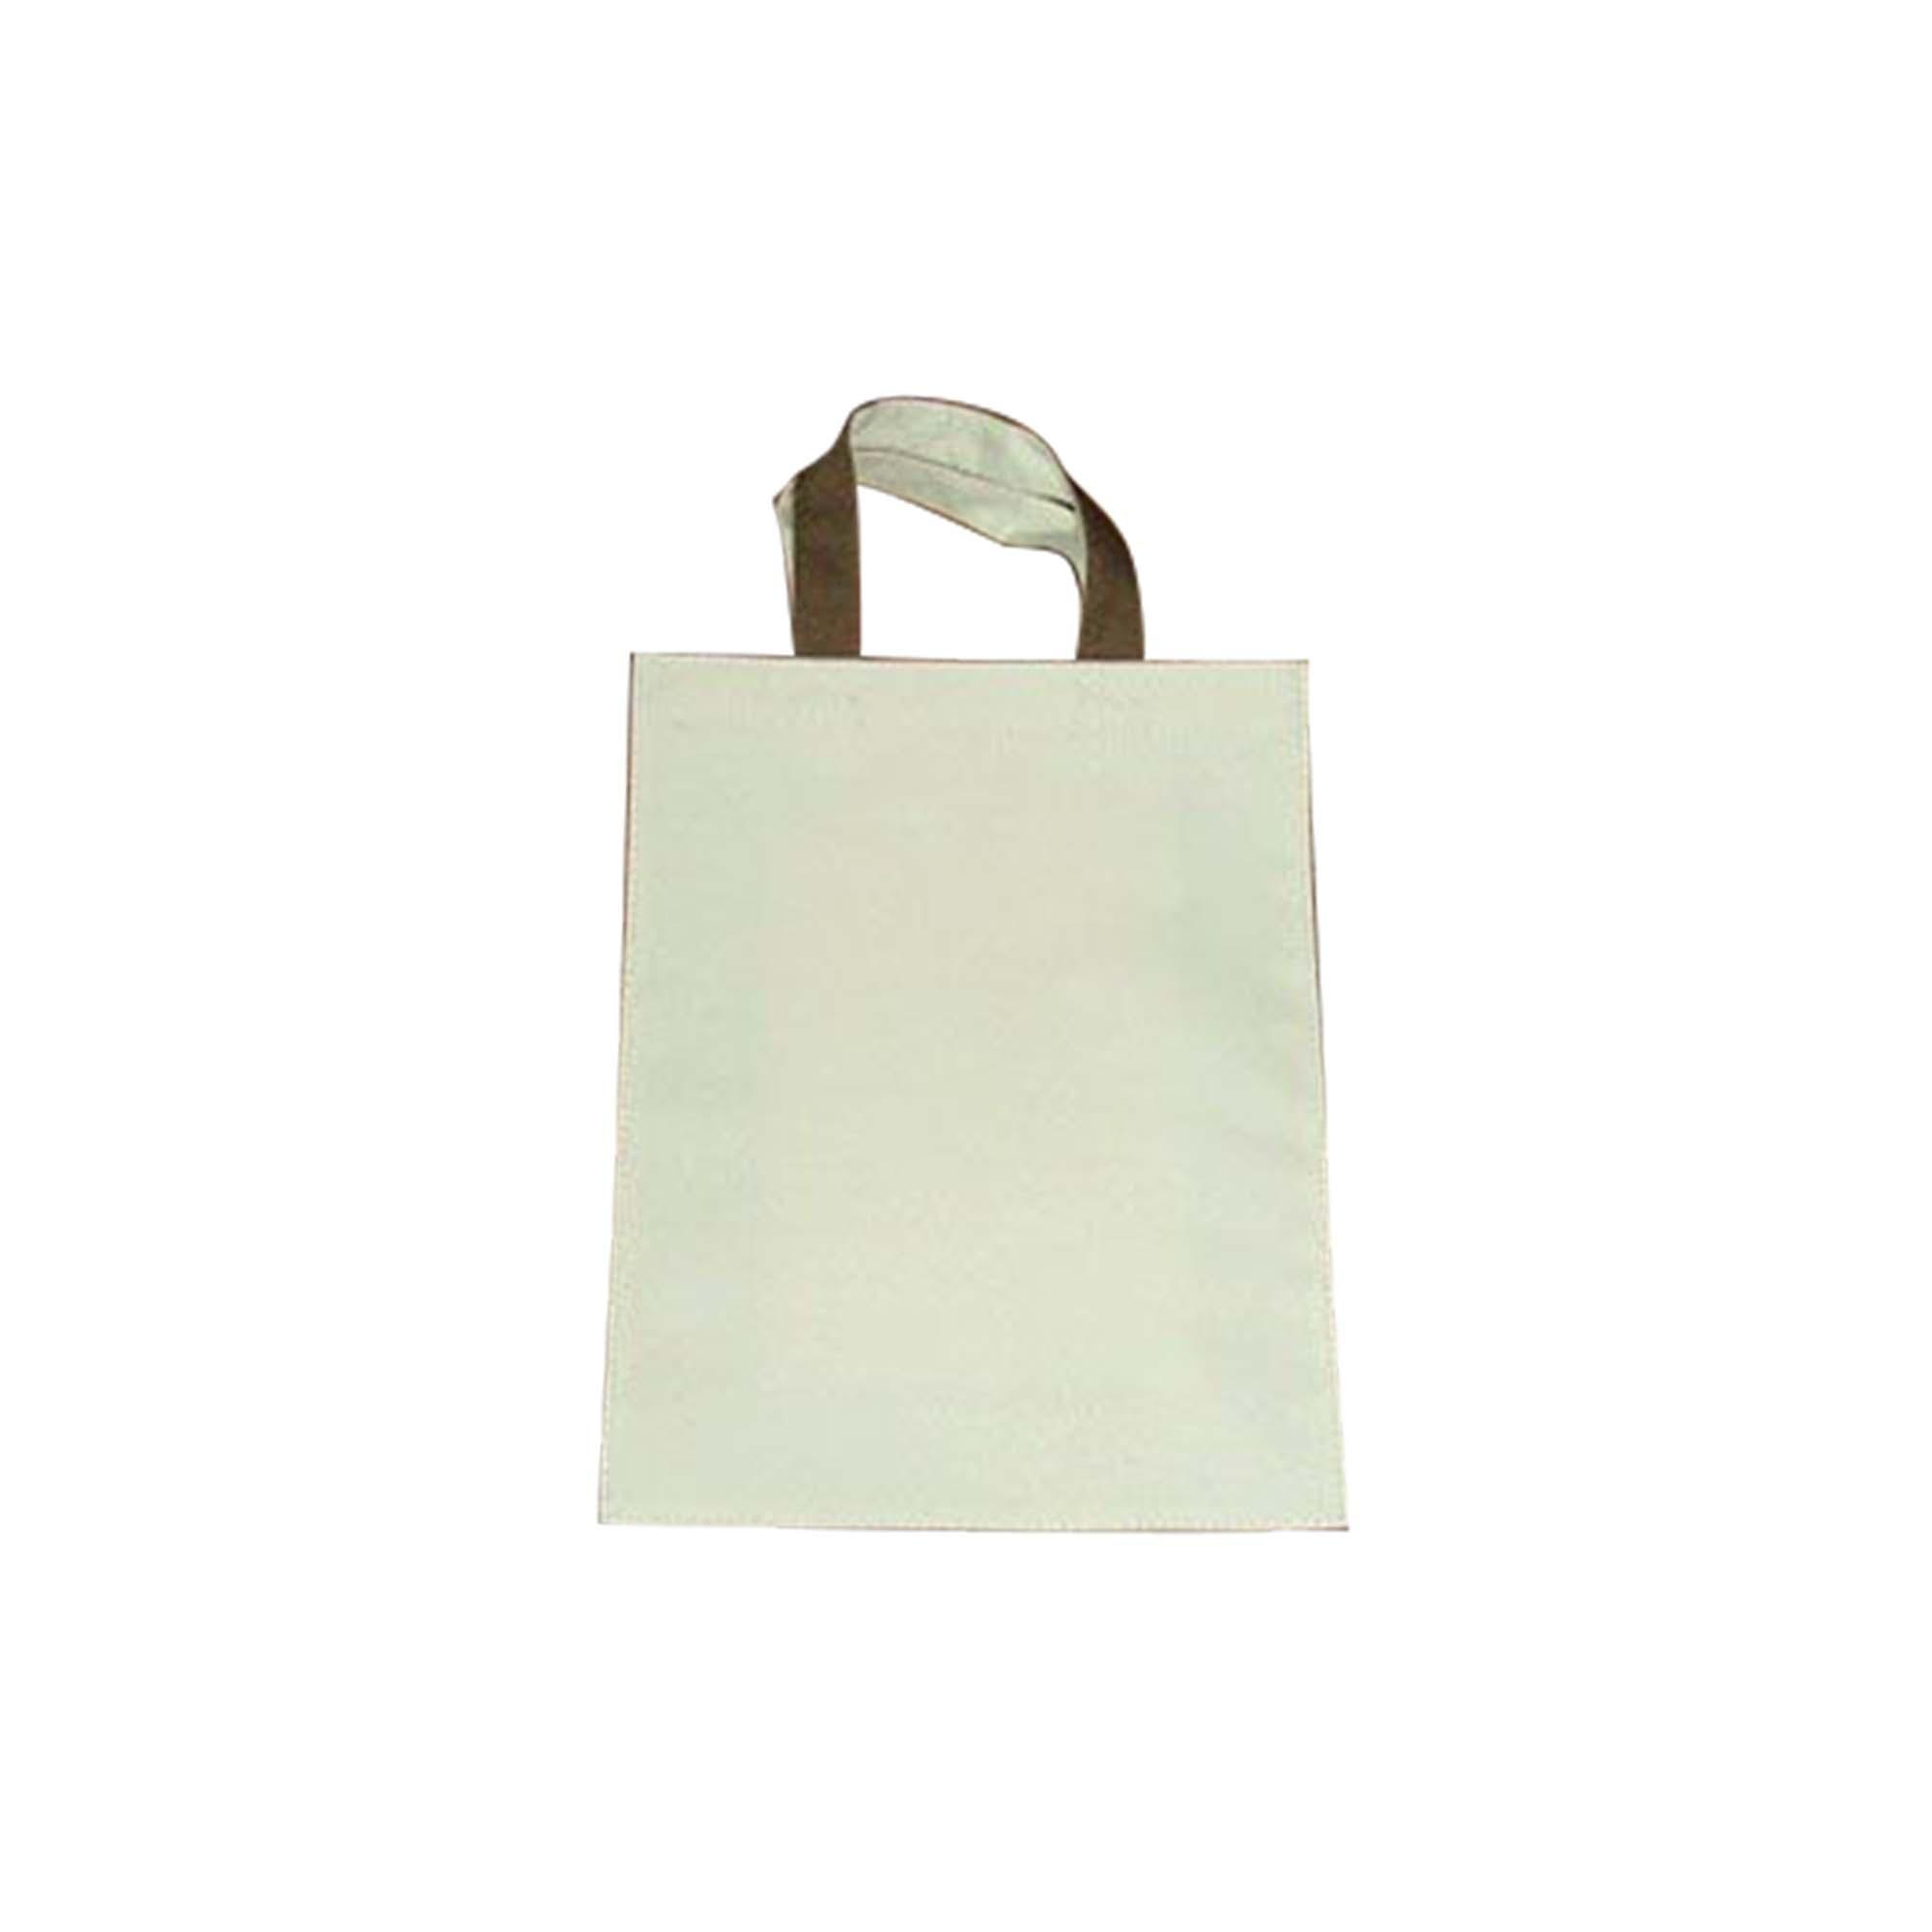 Tote shopping bag (08N/HH)